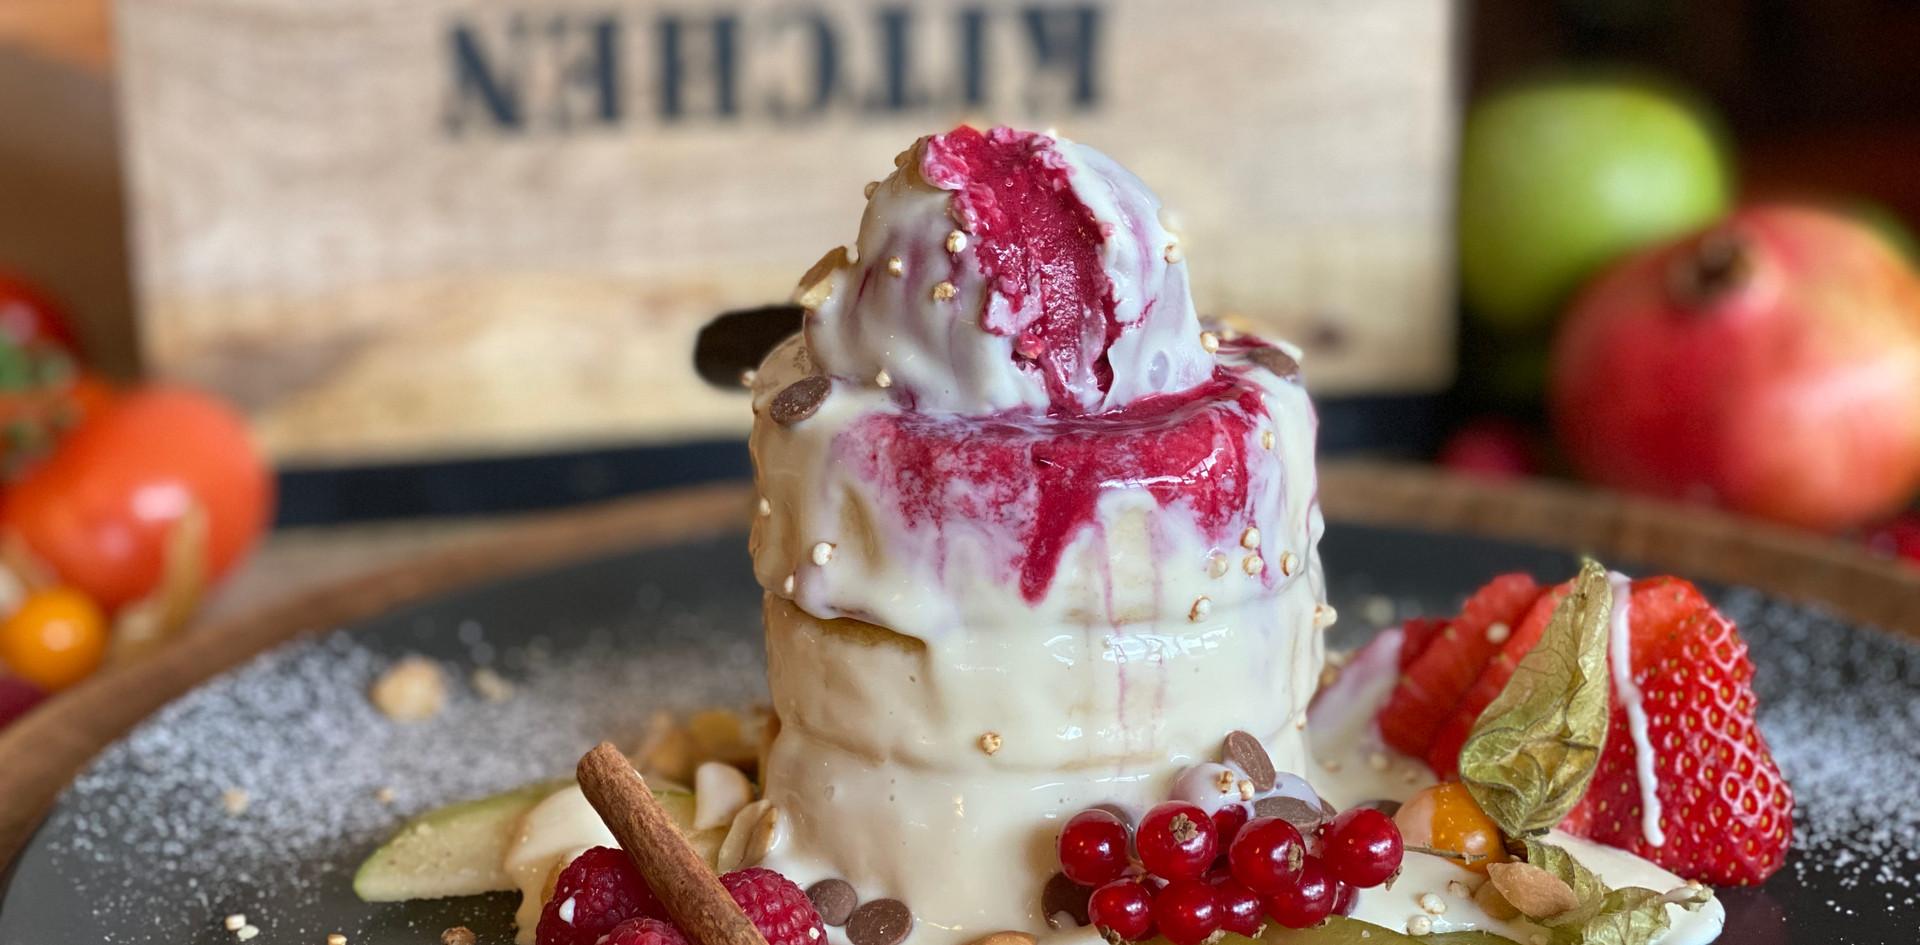 Pancakes mit Vanillesoße Frühstücks-Manufaktur - Hotel Wegner - The culinary Art Hotel